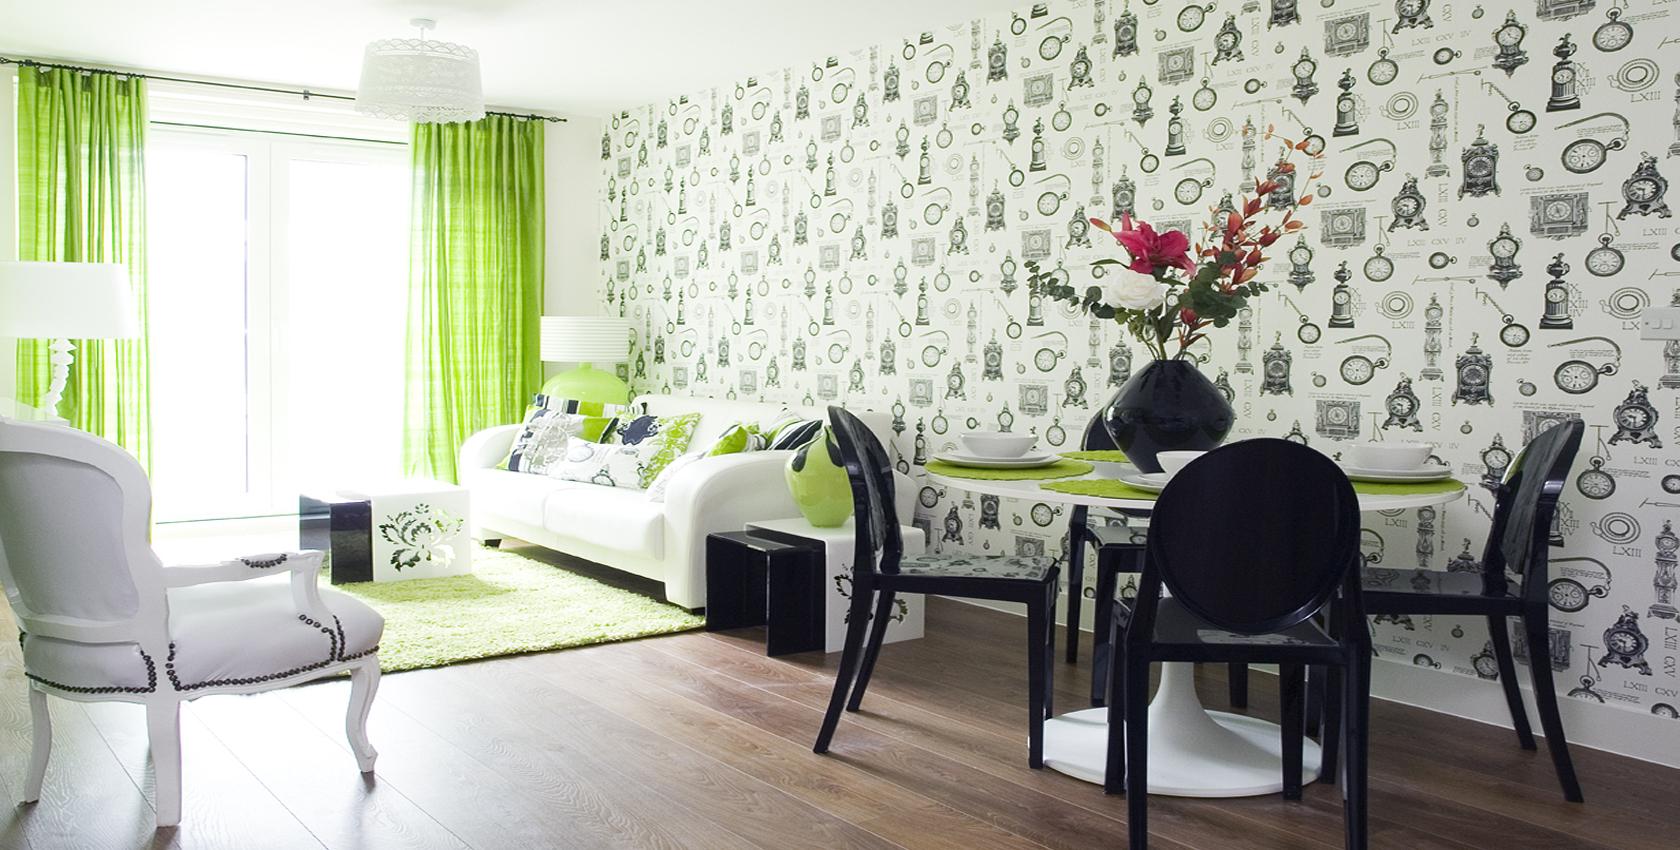 tara-larkin-interior-stylist-london-4.jpg